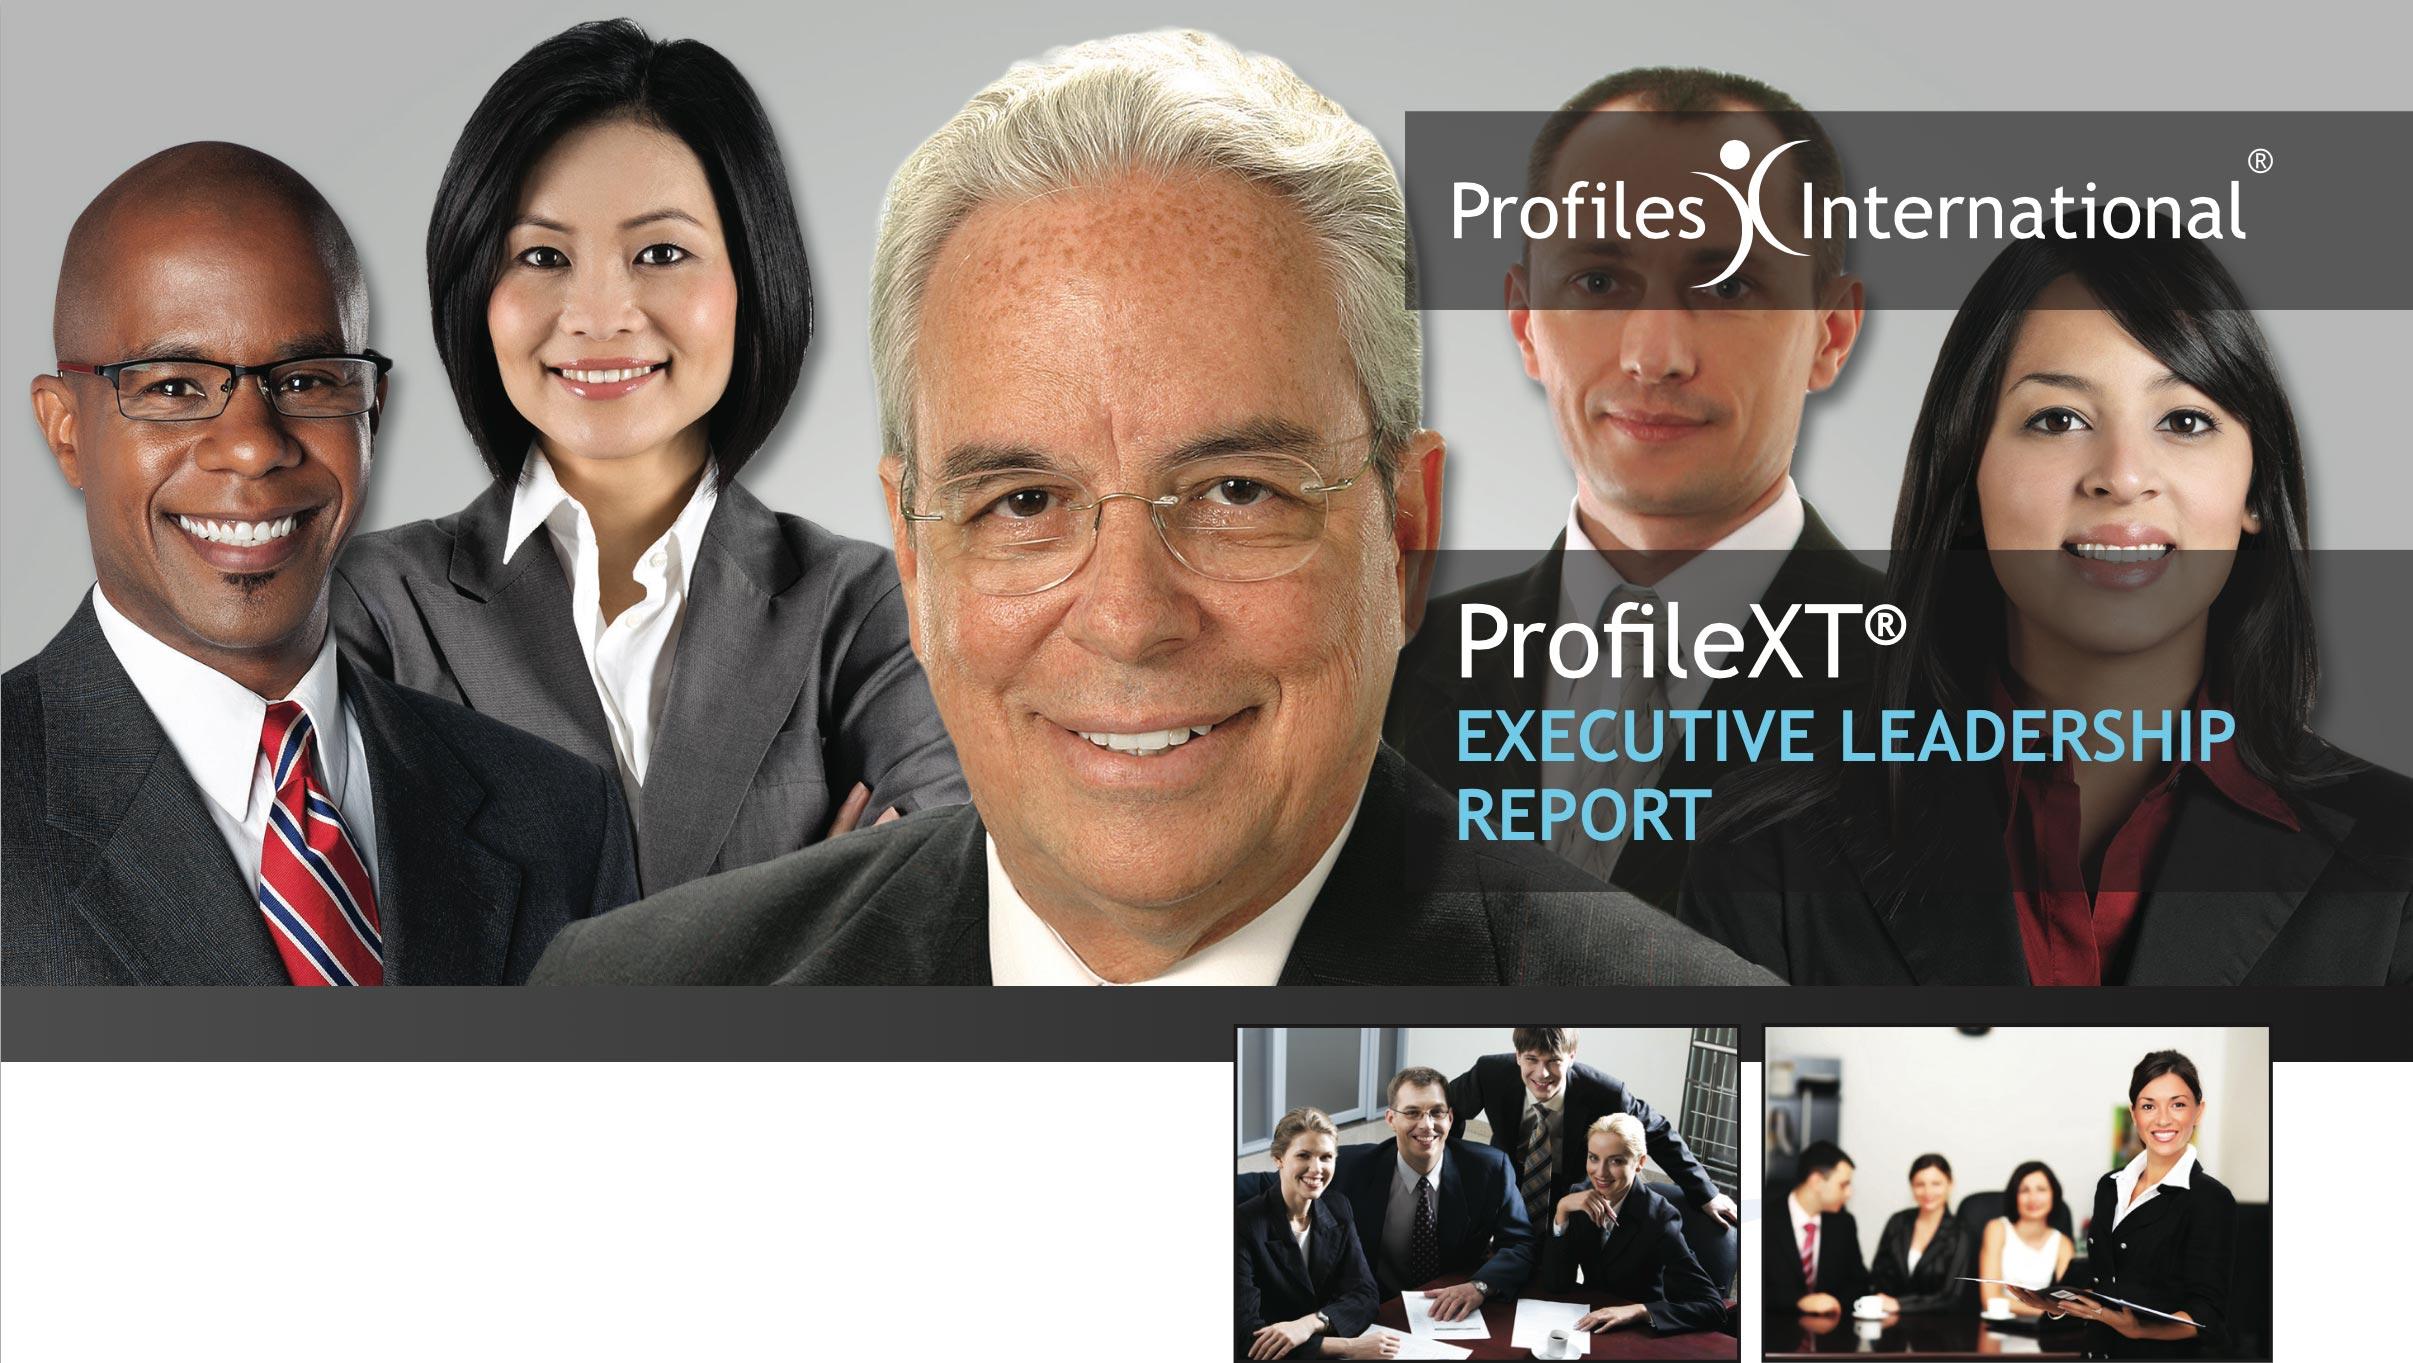 ProfileXT Executive Leadership Report